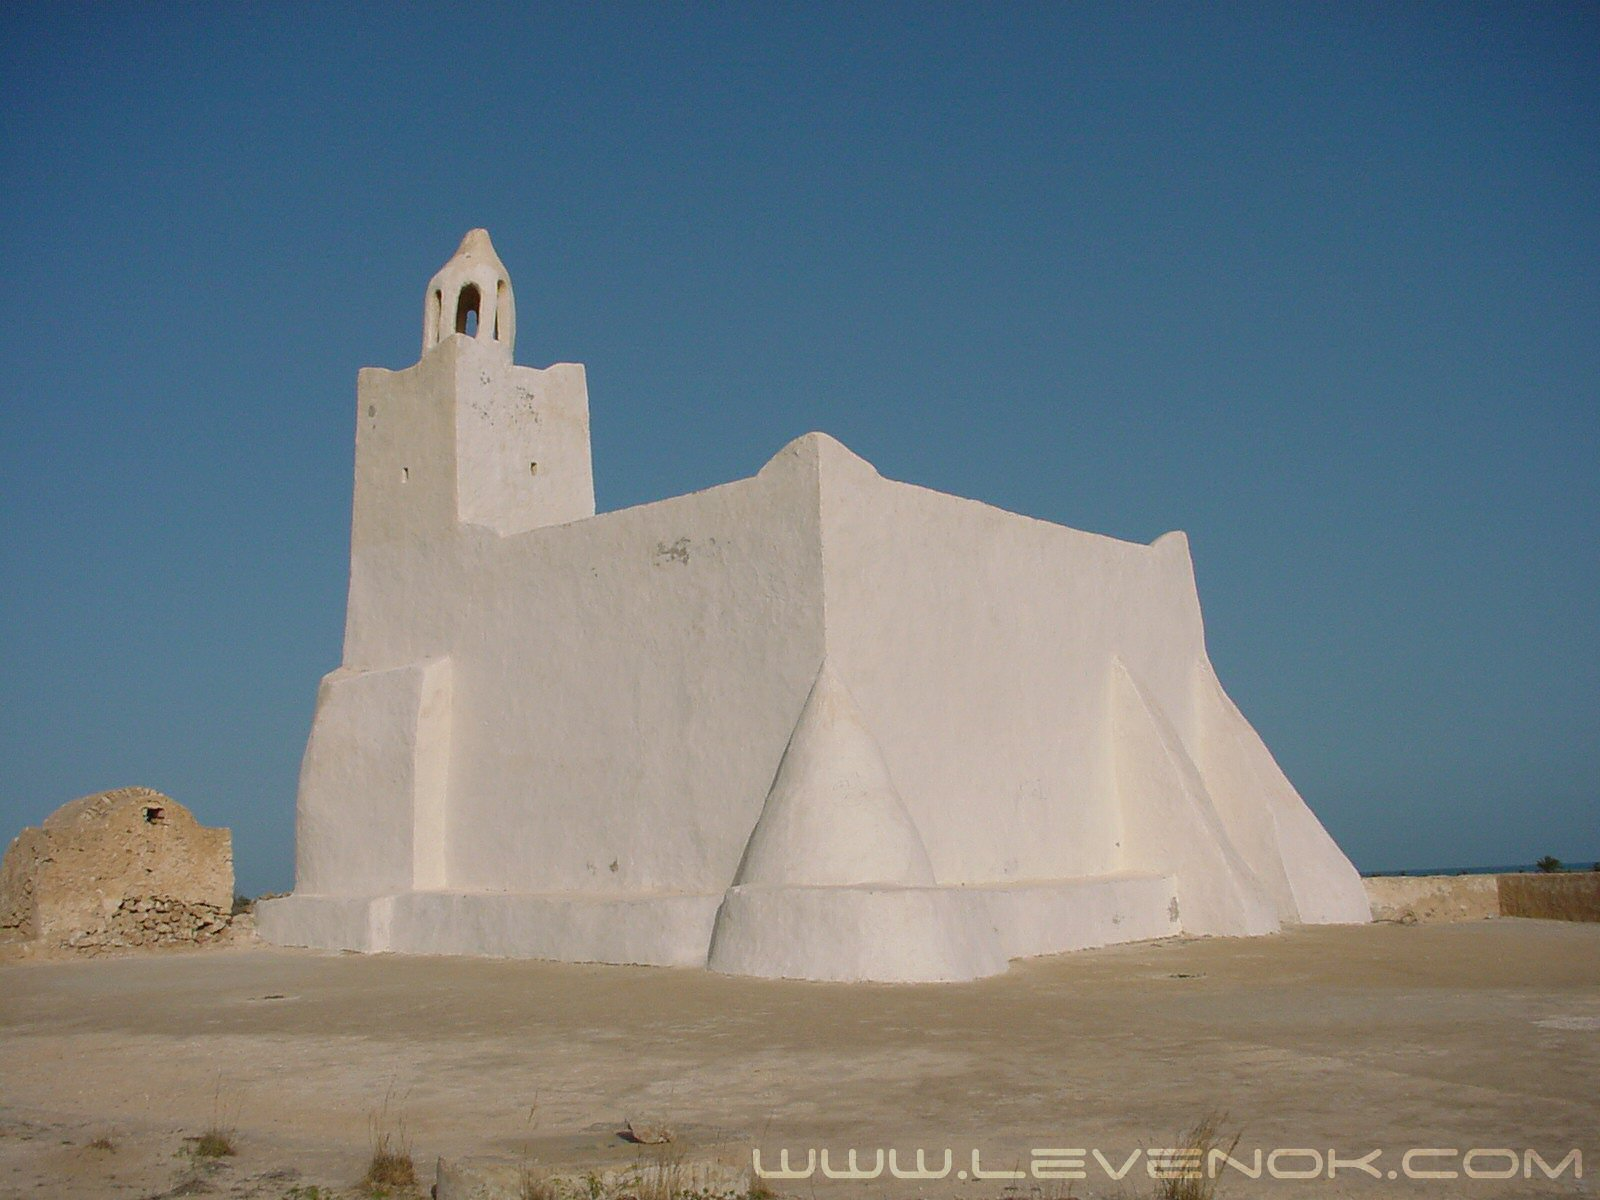 Image de 200108_Djerba_Mosquee.jpg